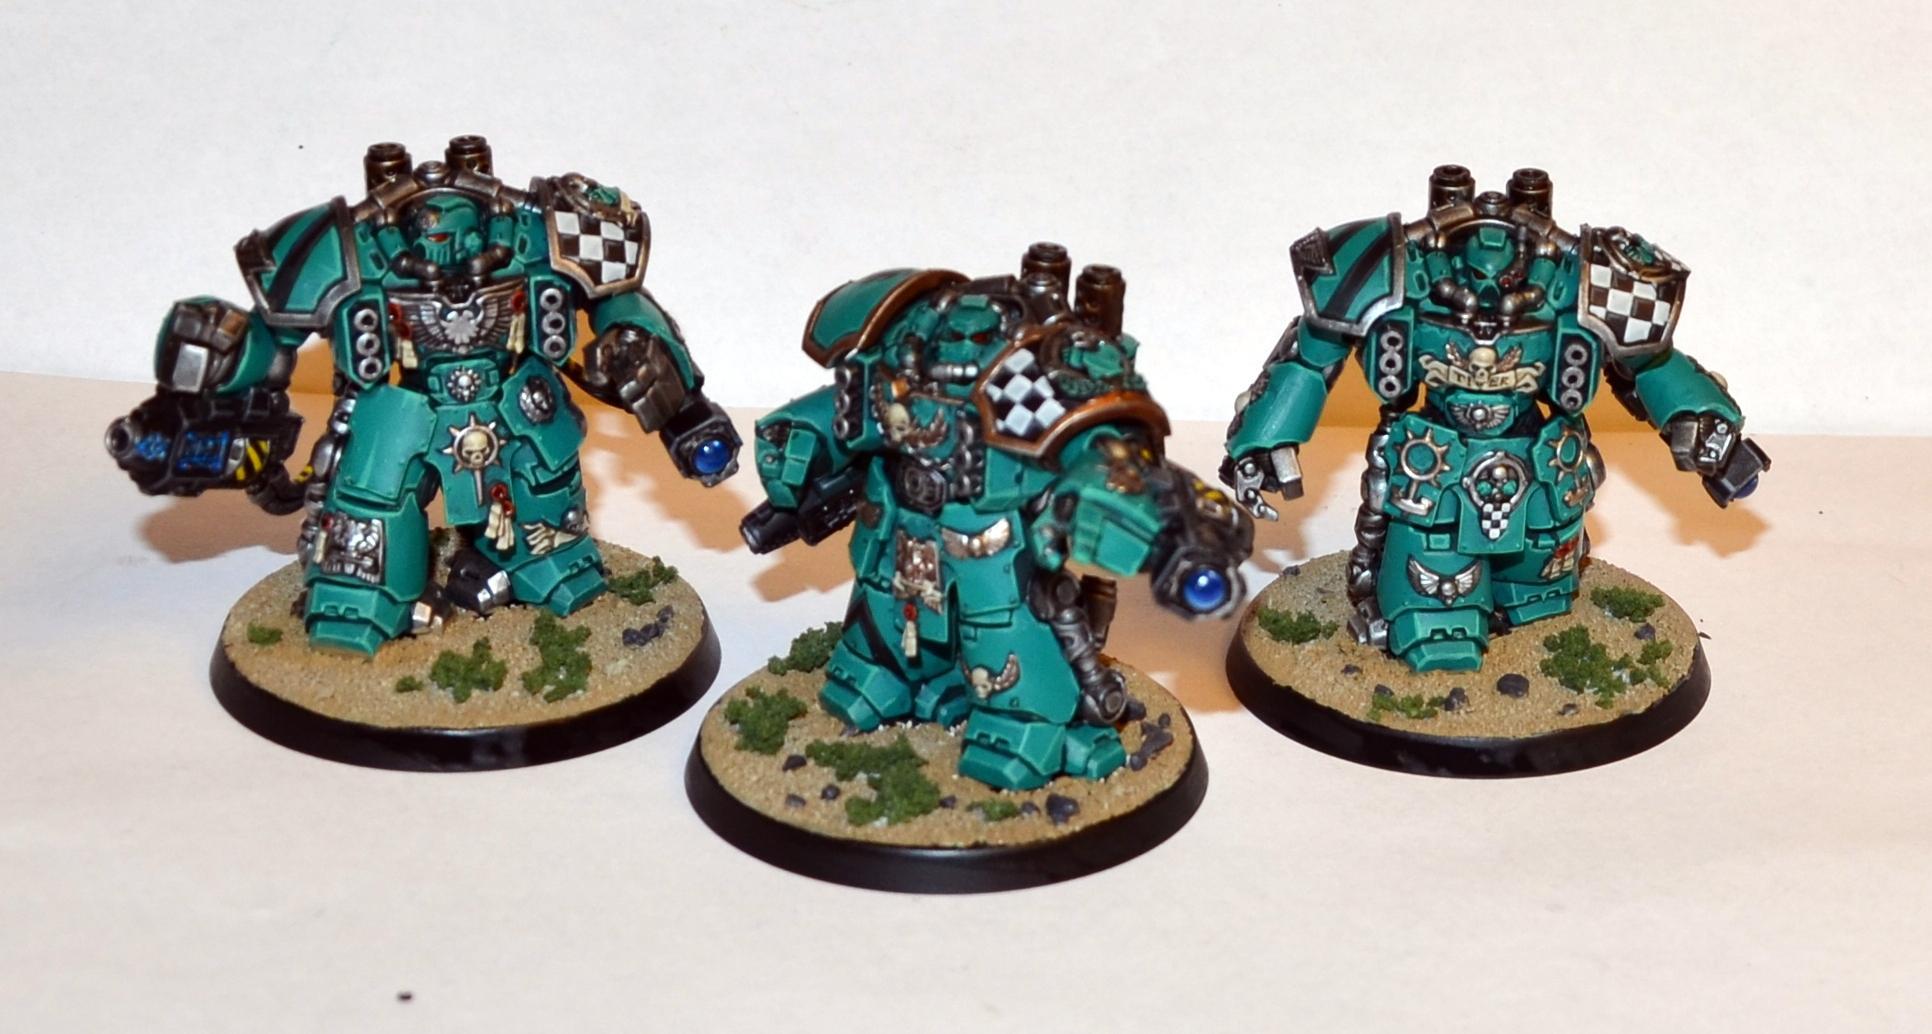 Centurions, Jade Tigers, Space Marines, Warhammer 40,000